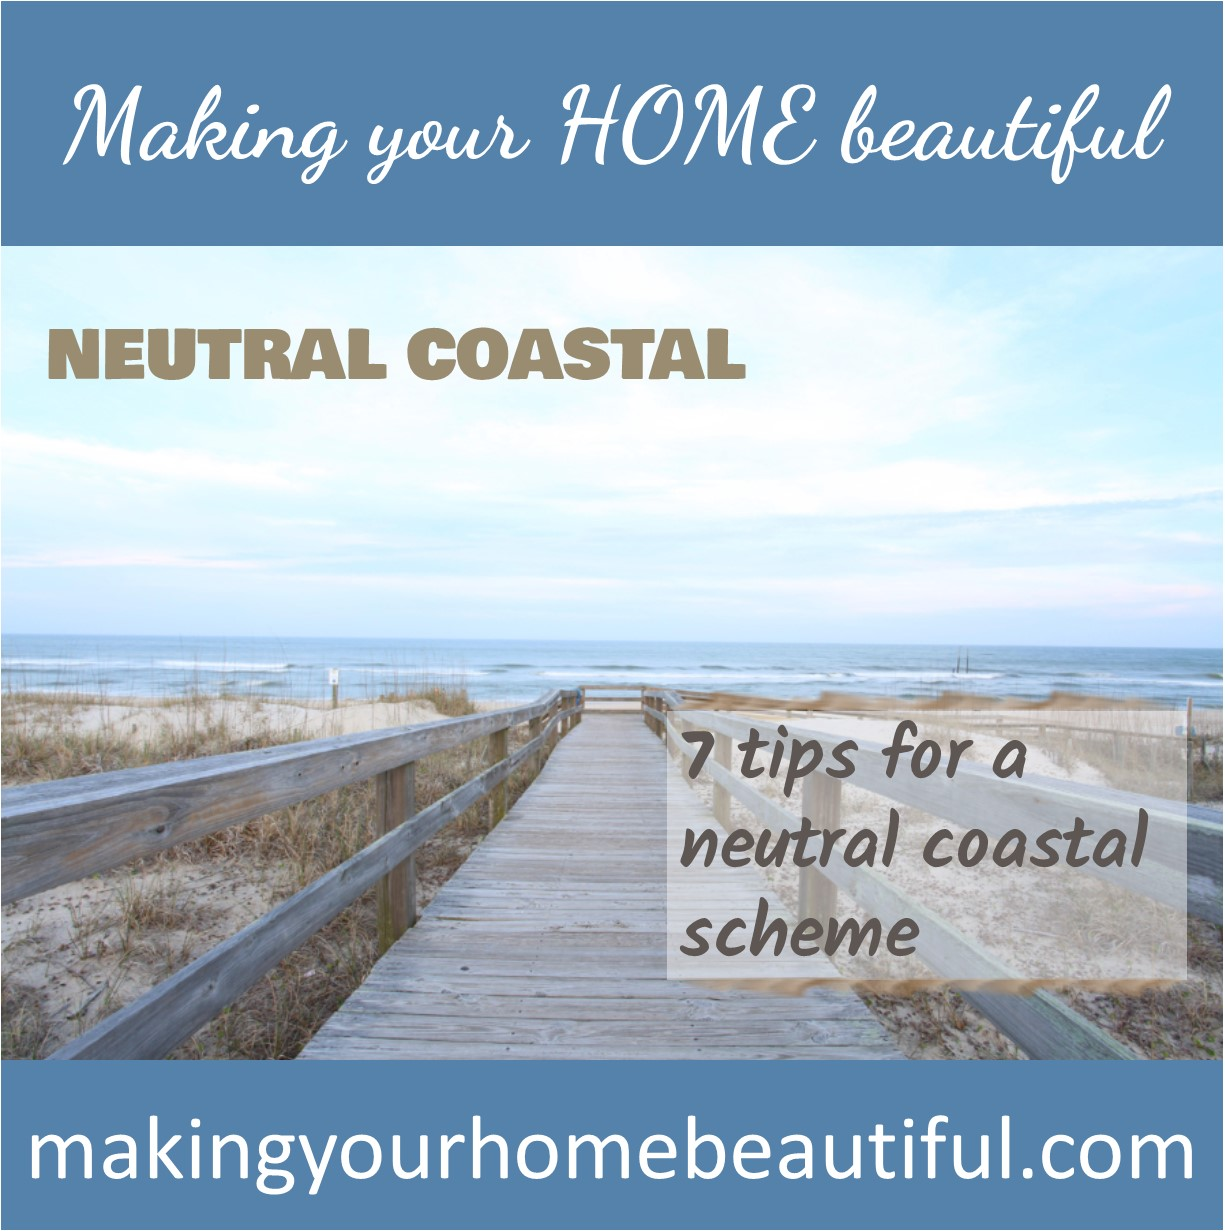 7 tips for a neutral coastal scheme